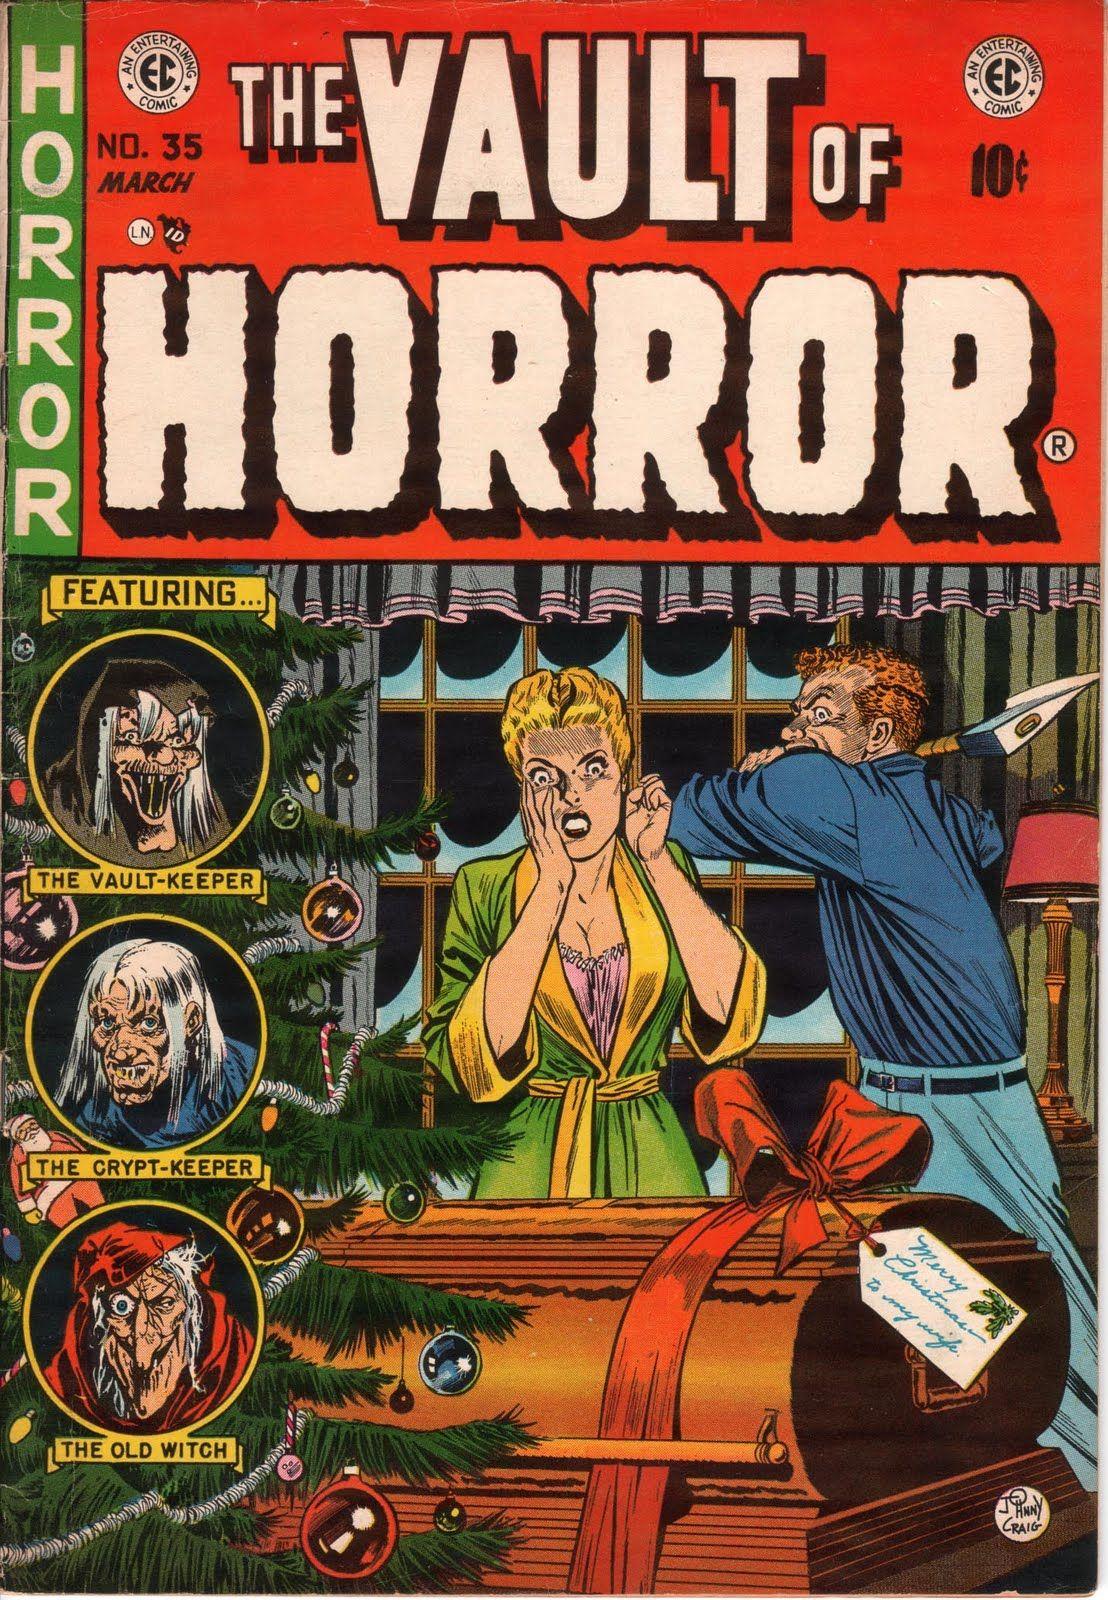 Comic terror wallpaper buscar con google comics pinterest comic terror wallpaper buscar con google fandeluxe Images